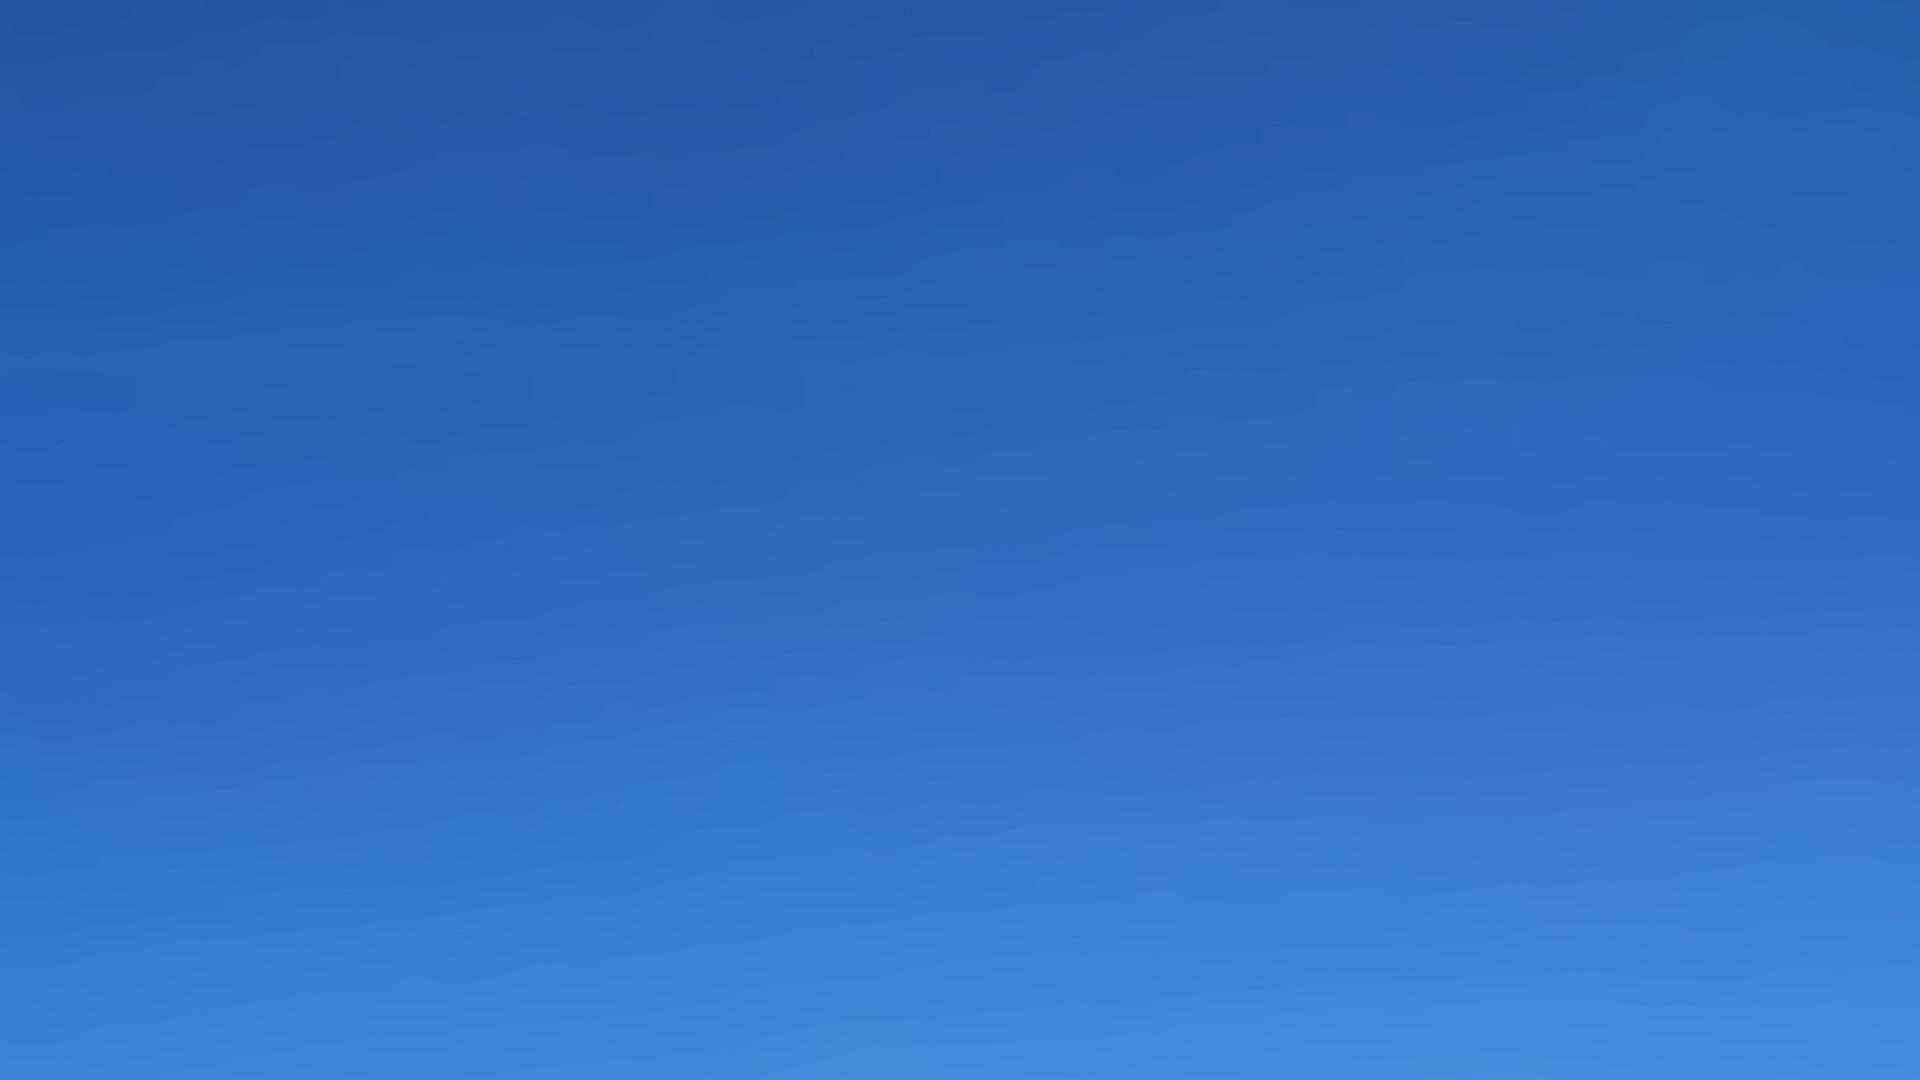 blue blue sky 1920x1080